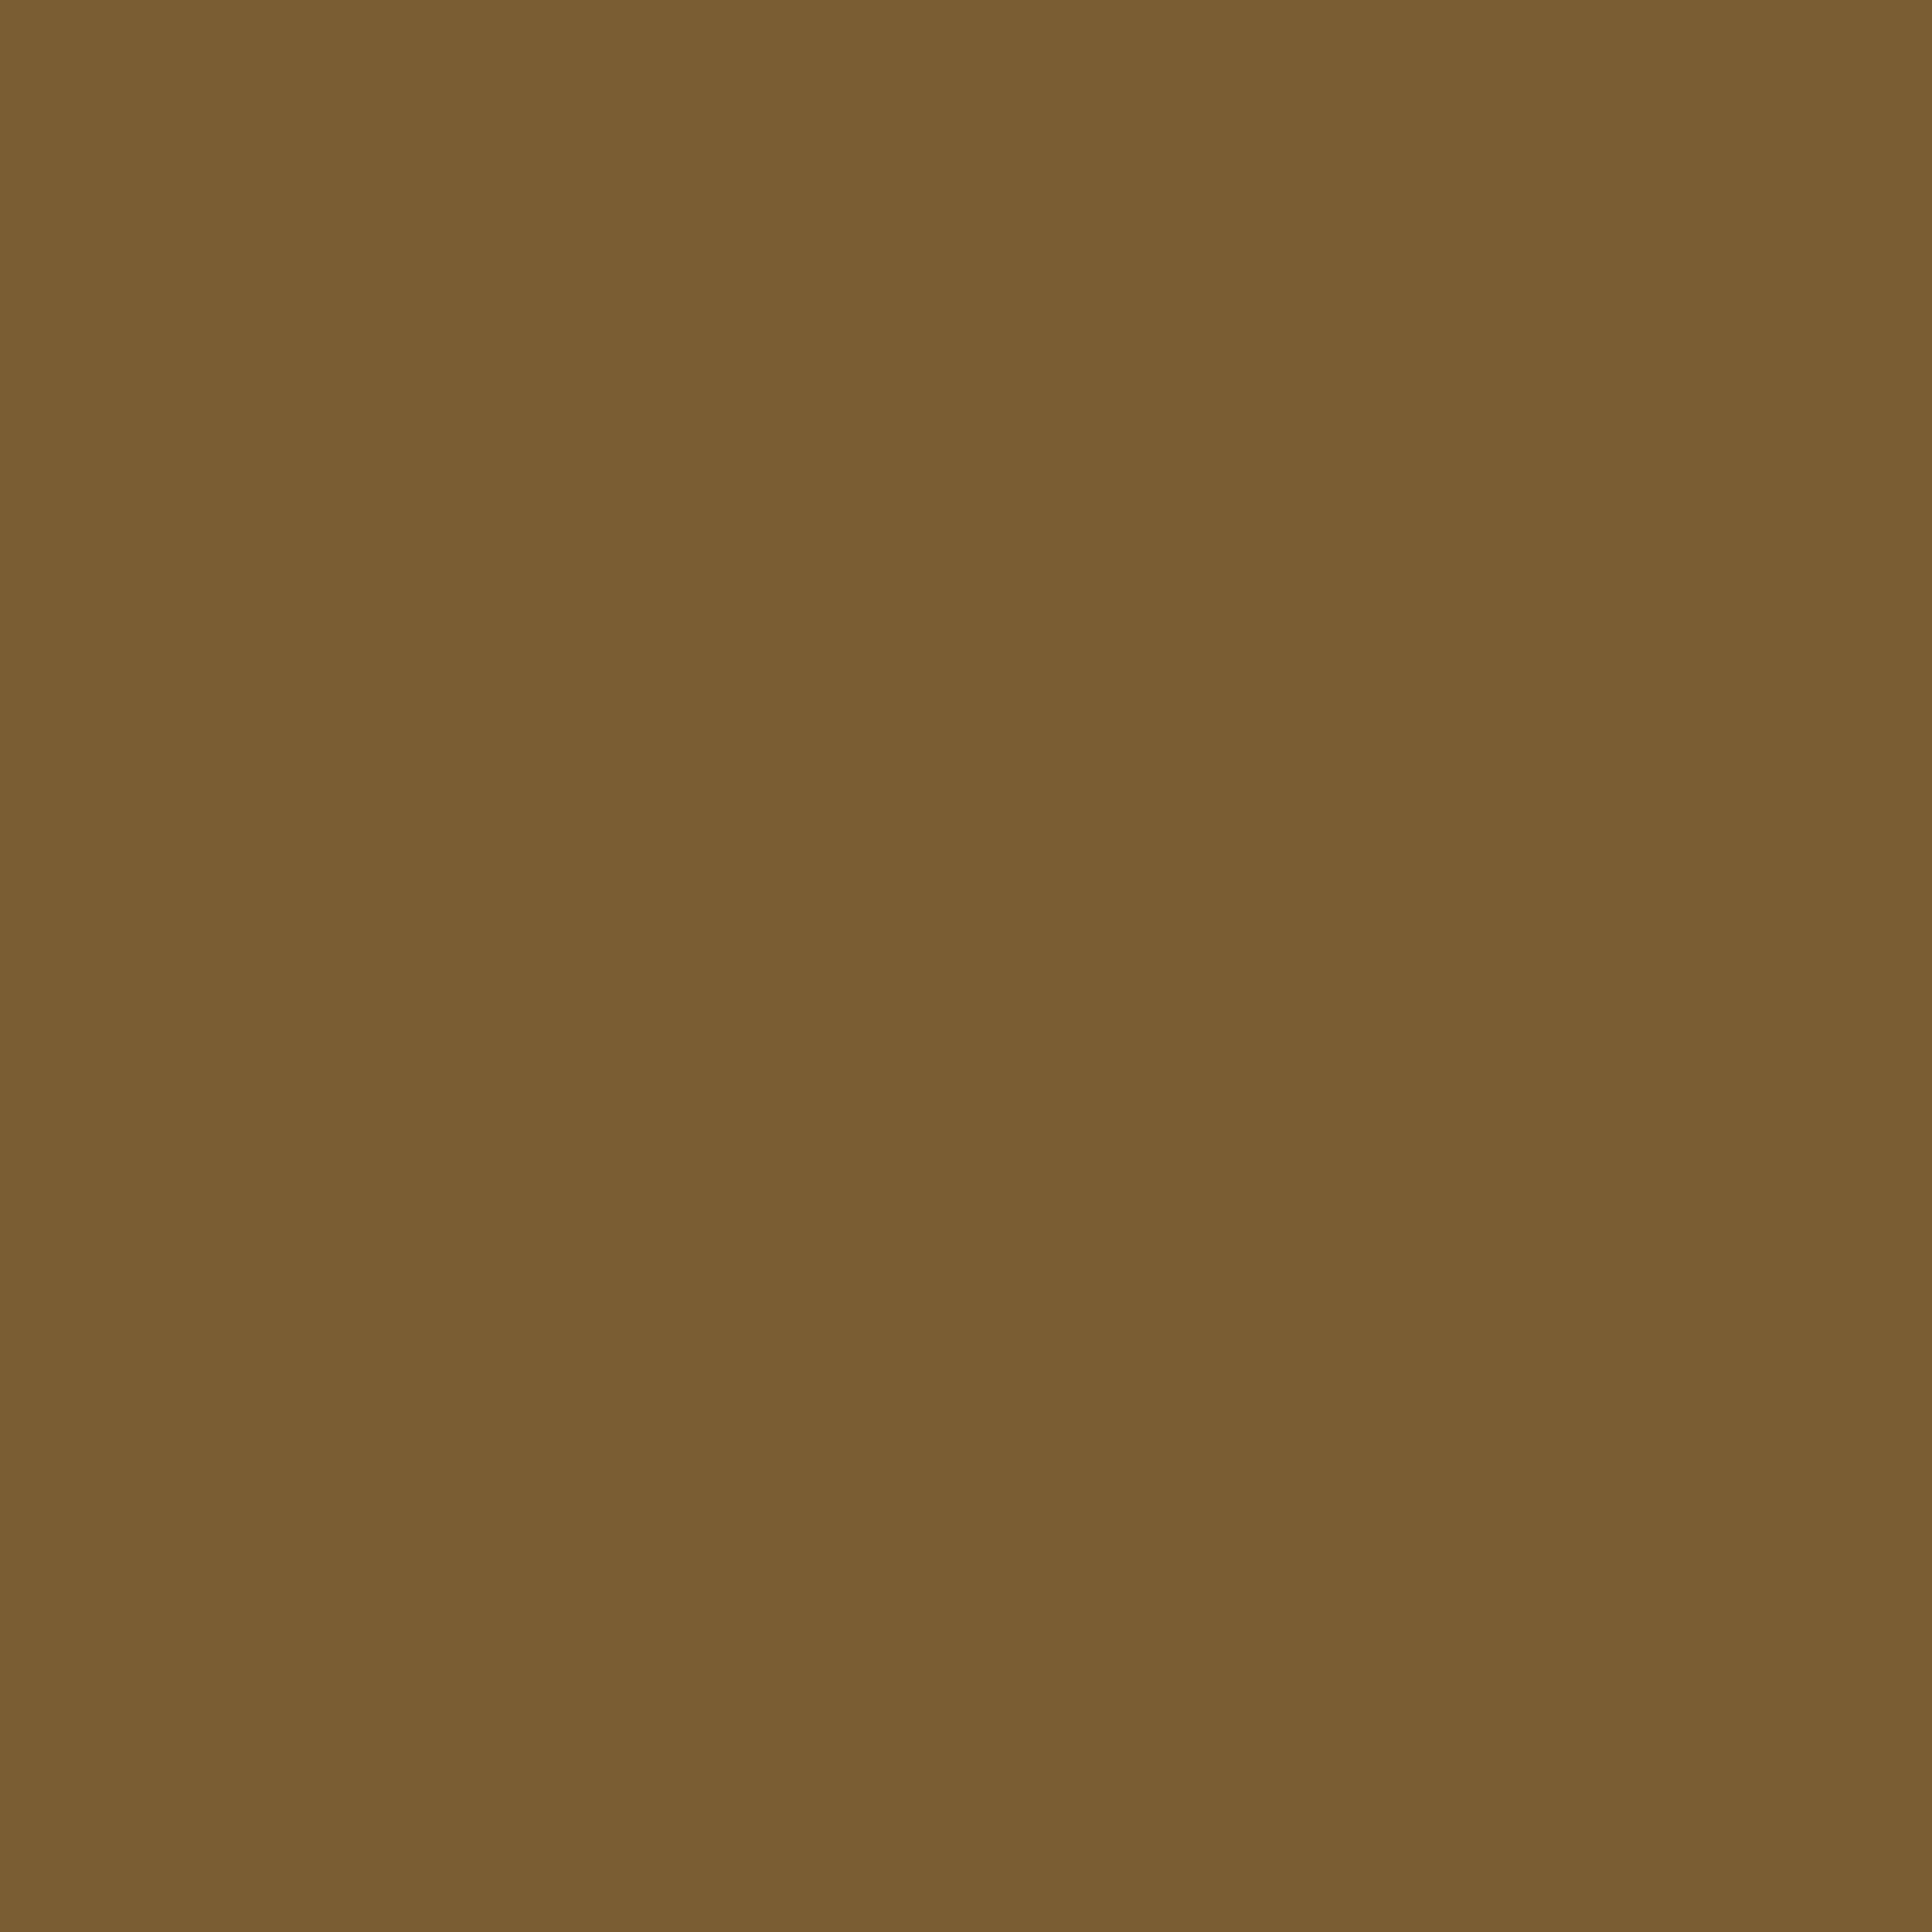 Soft Brown